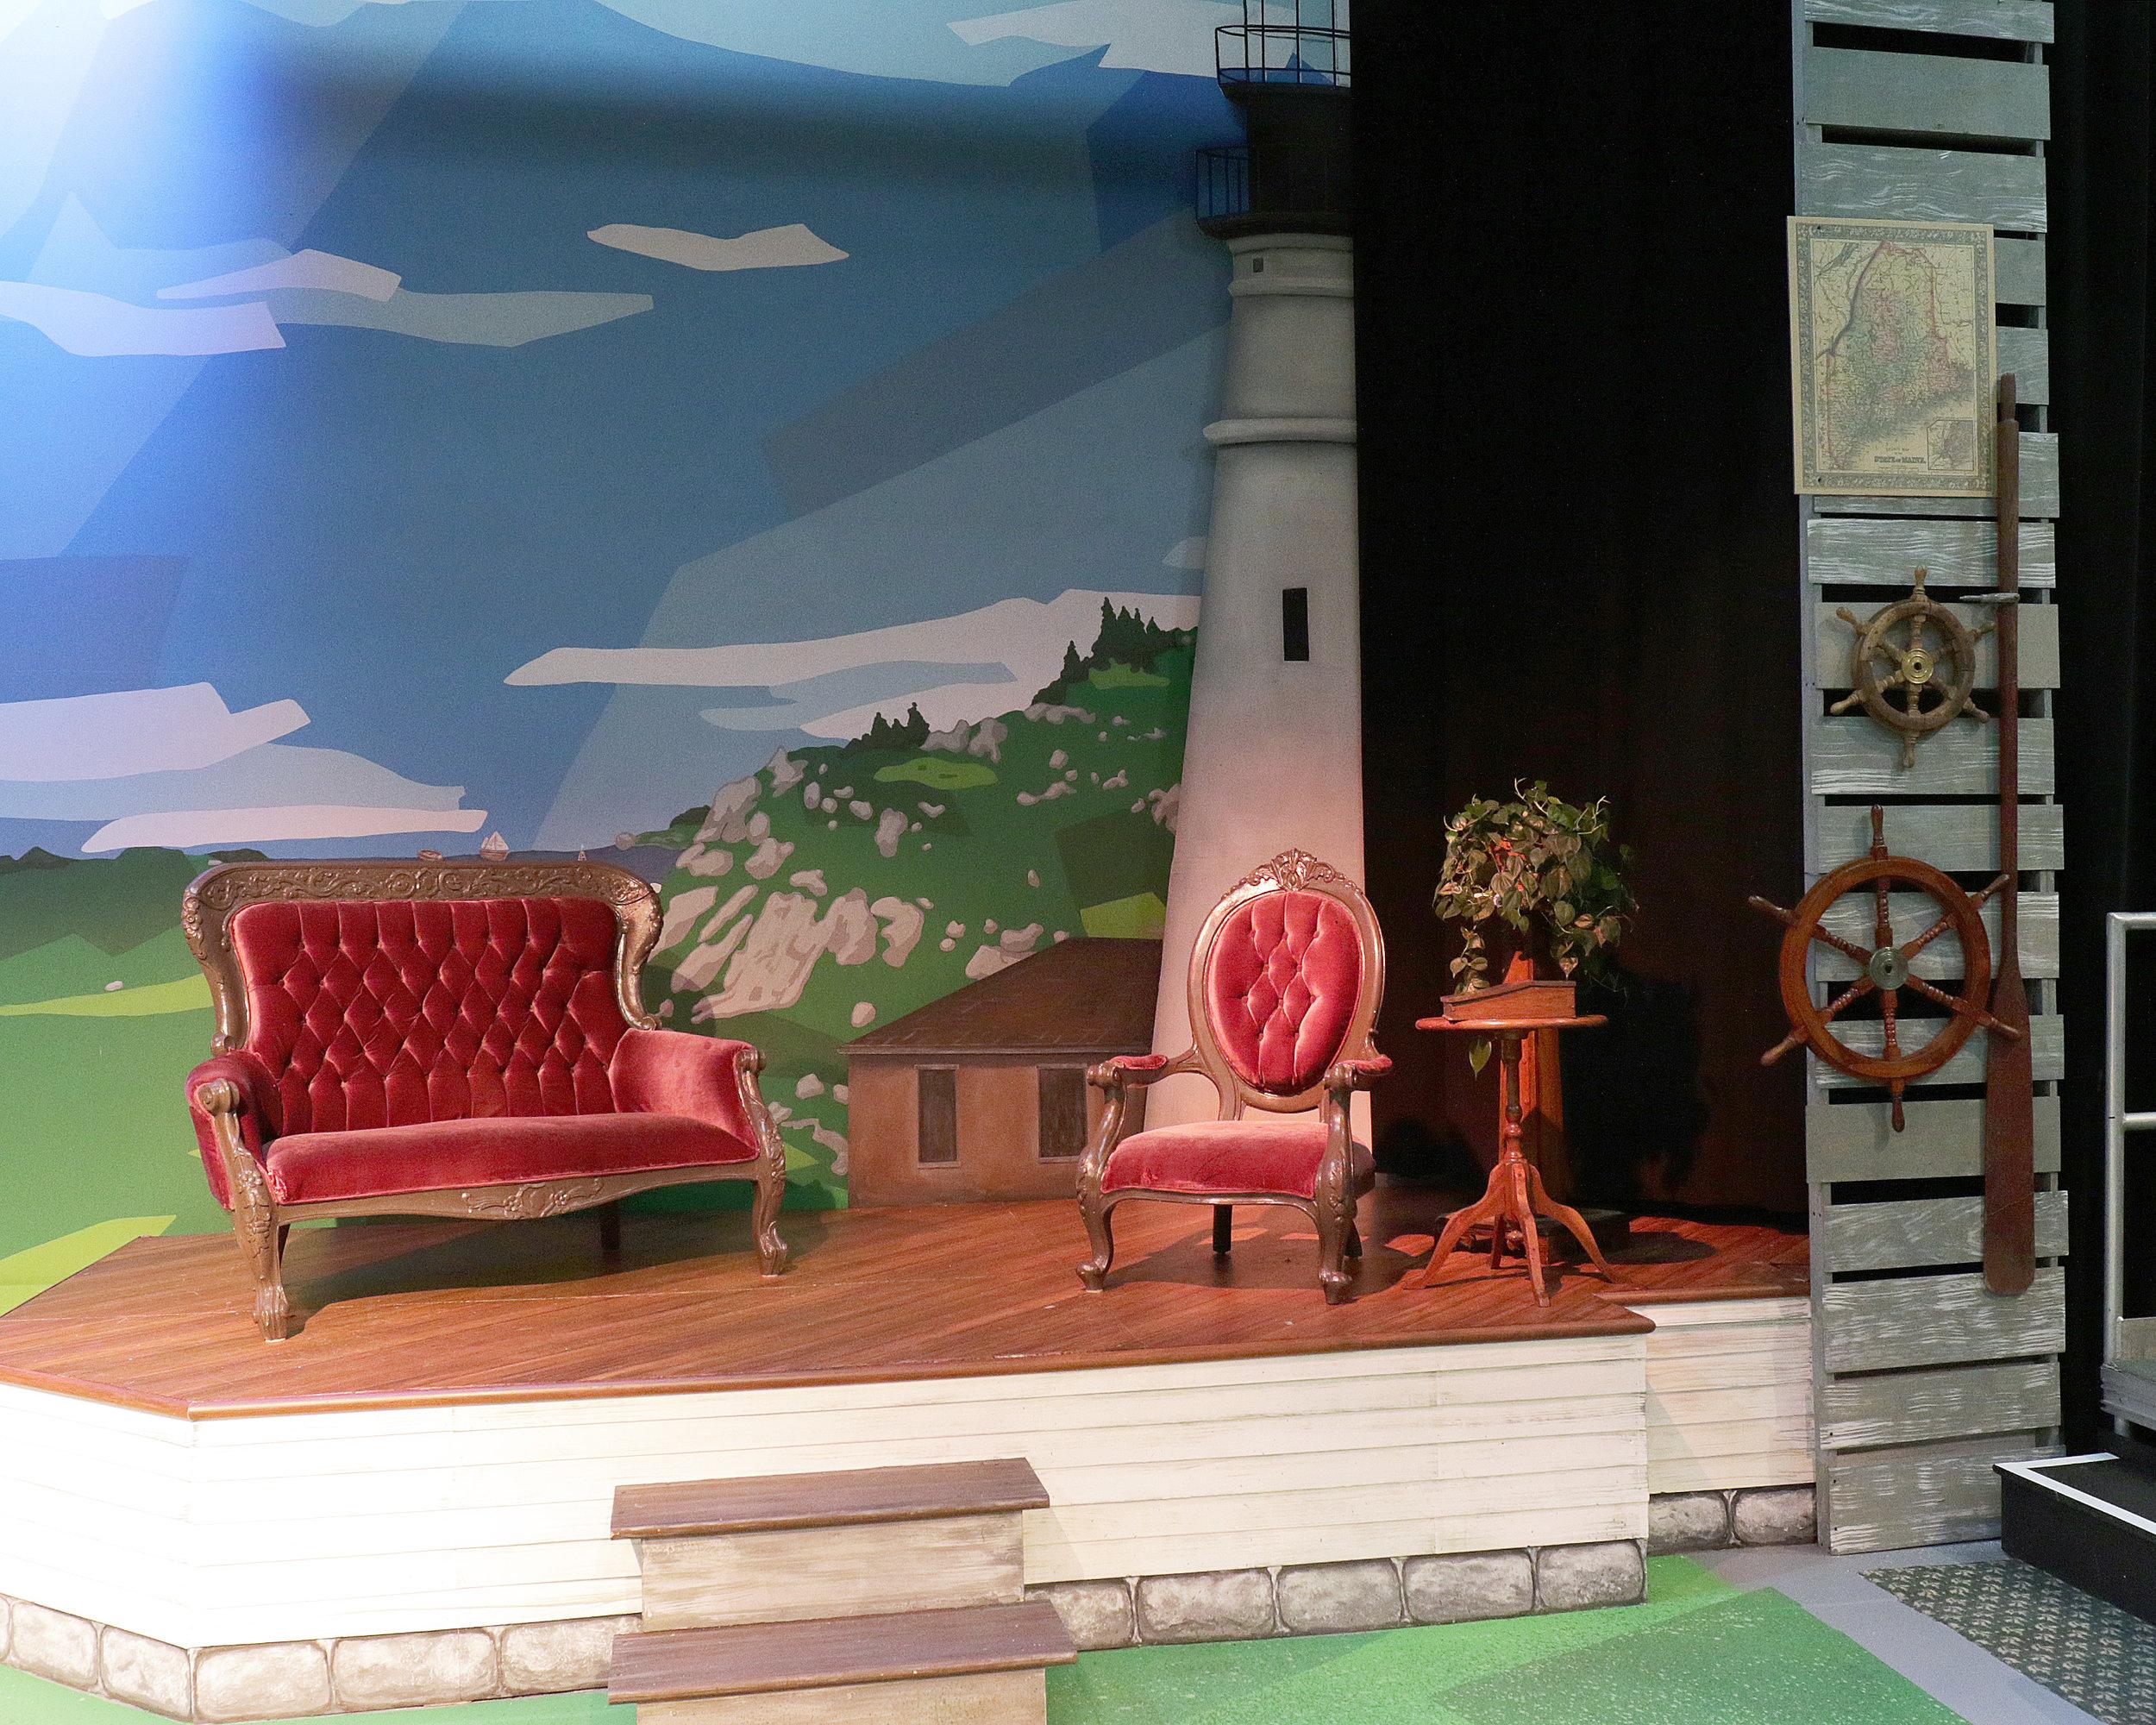 Sarah, Plain and Tall  by Joseph Robinette  Kate Goldman Children's Theater at the Des Moines Playhouse  (Allison McGuire, Director; Kevin Shelby, Scenic Designer;Susanna Douthit, Costume Designer; Virgil  Kleinhesselink, Lighting Designer)